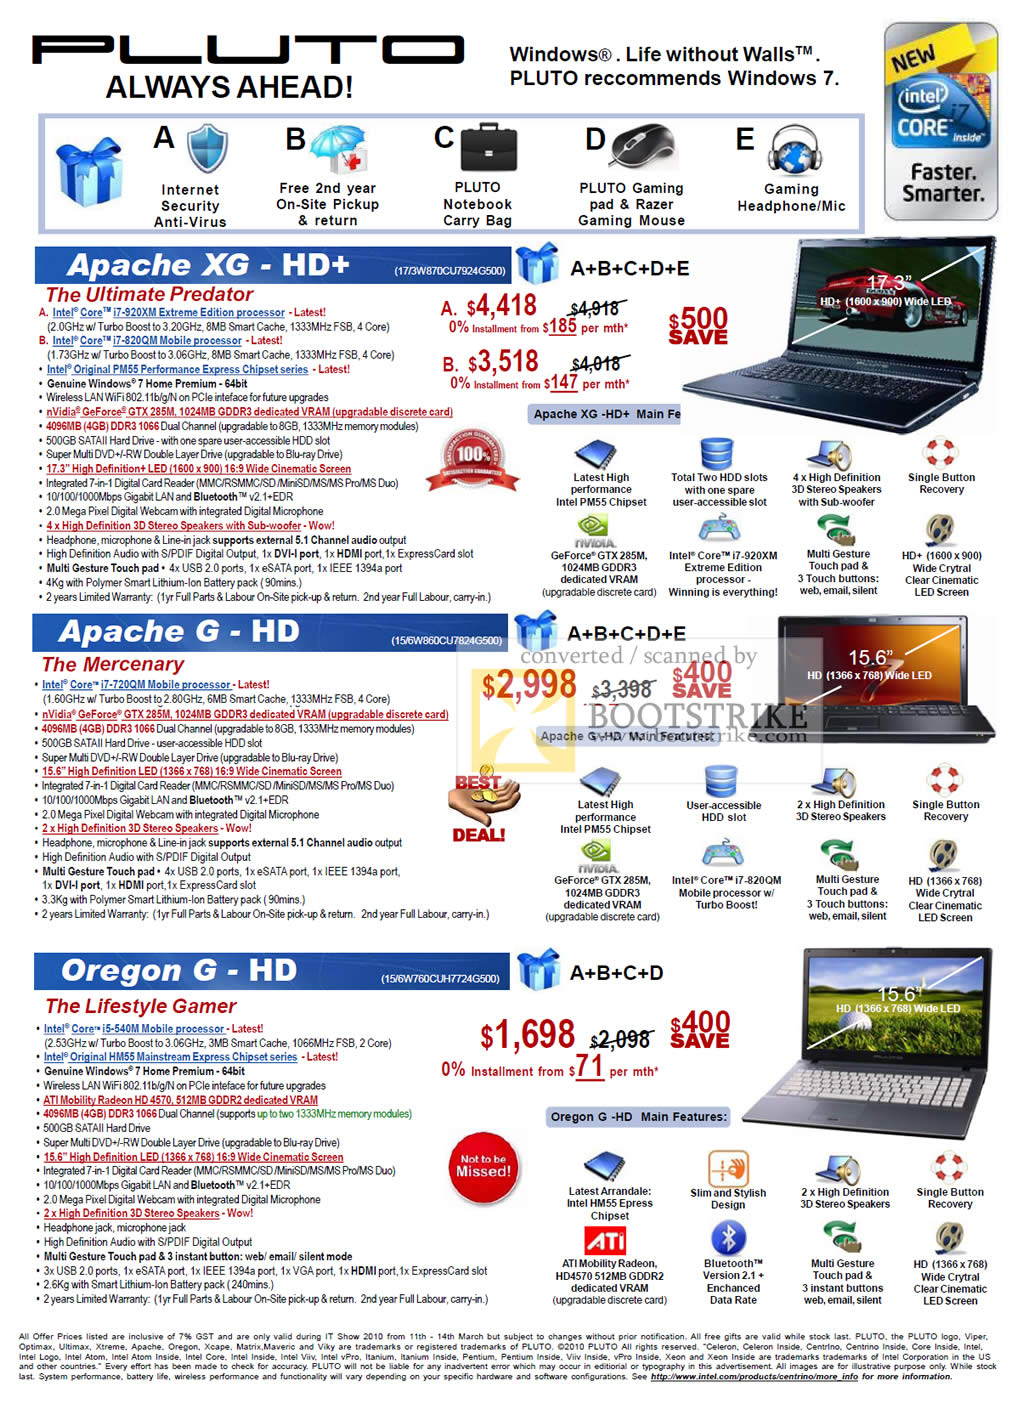 PC Show 2010 price list image brochure of Pluto Technology Notebooks Apache XG HD G Oregon